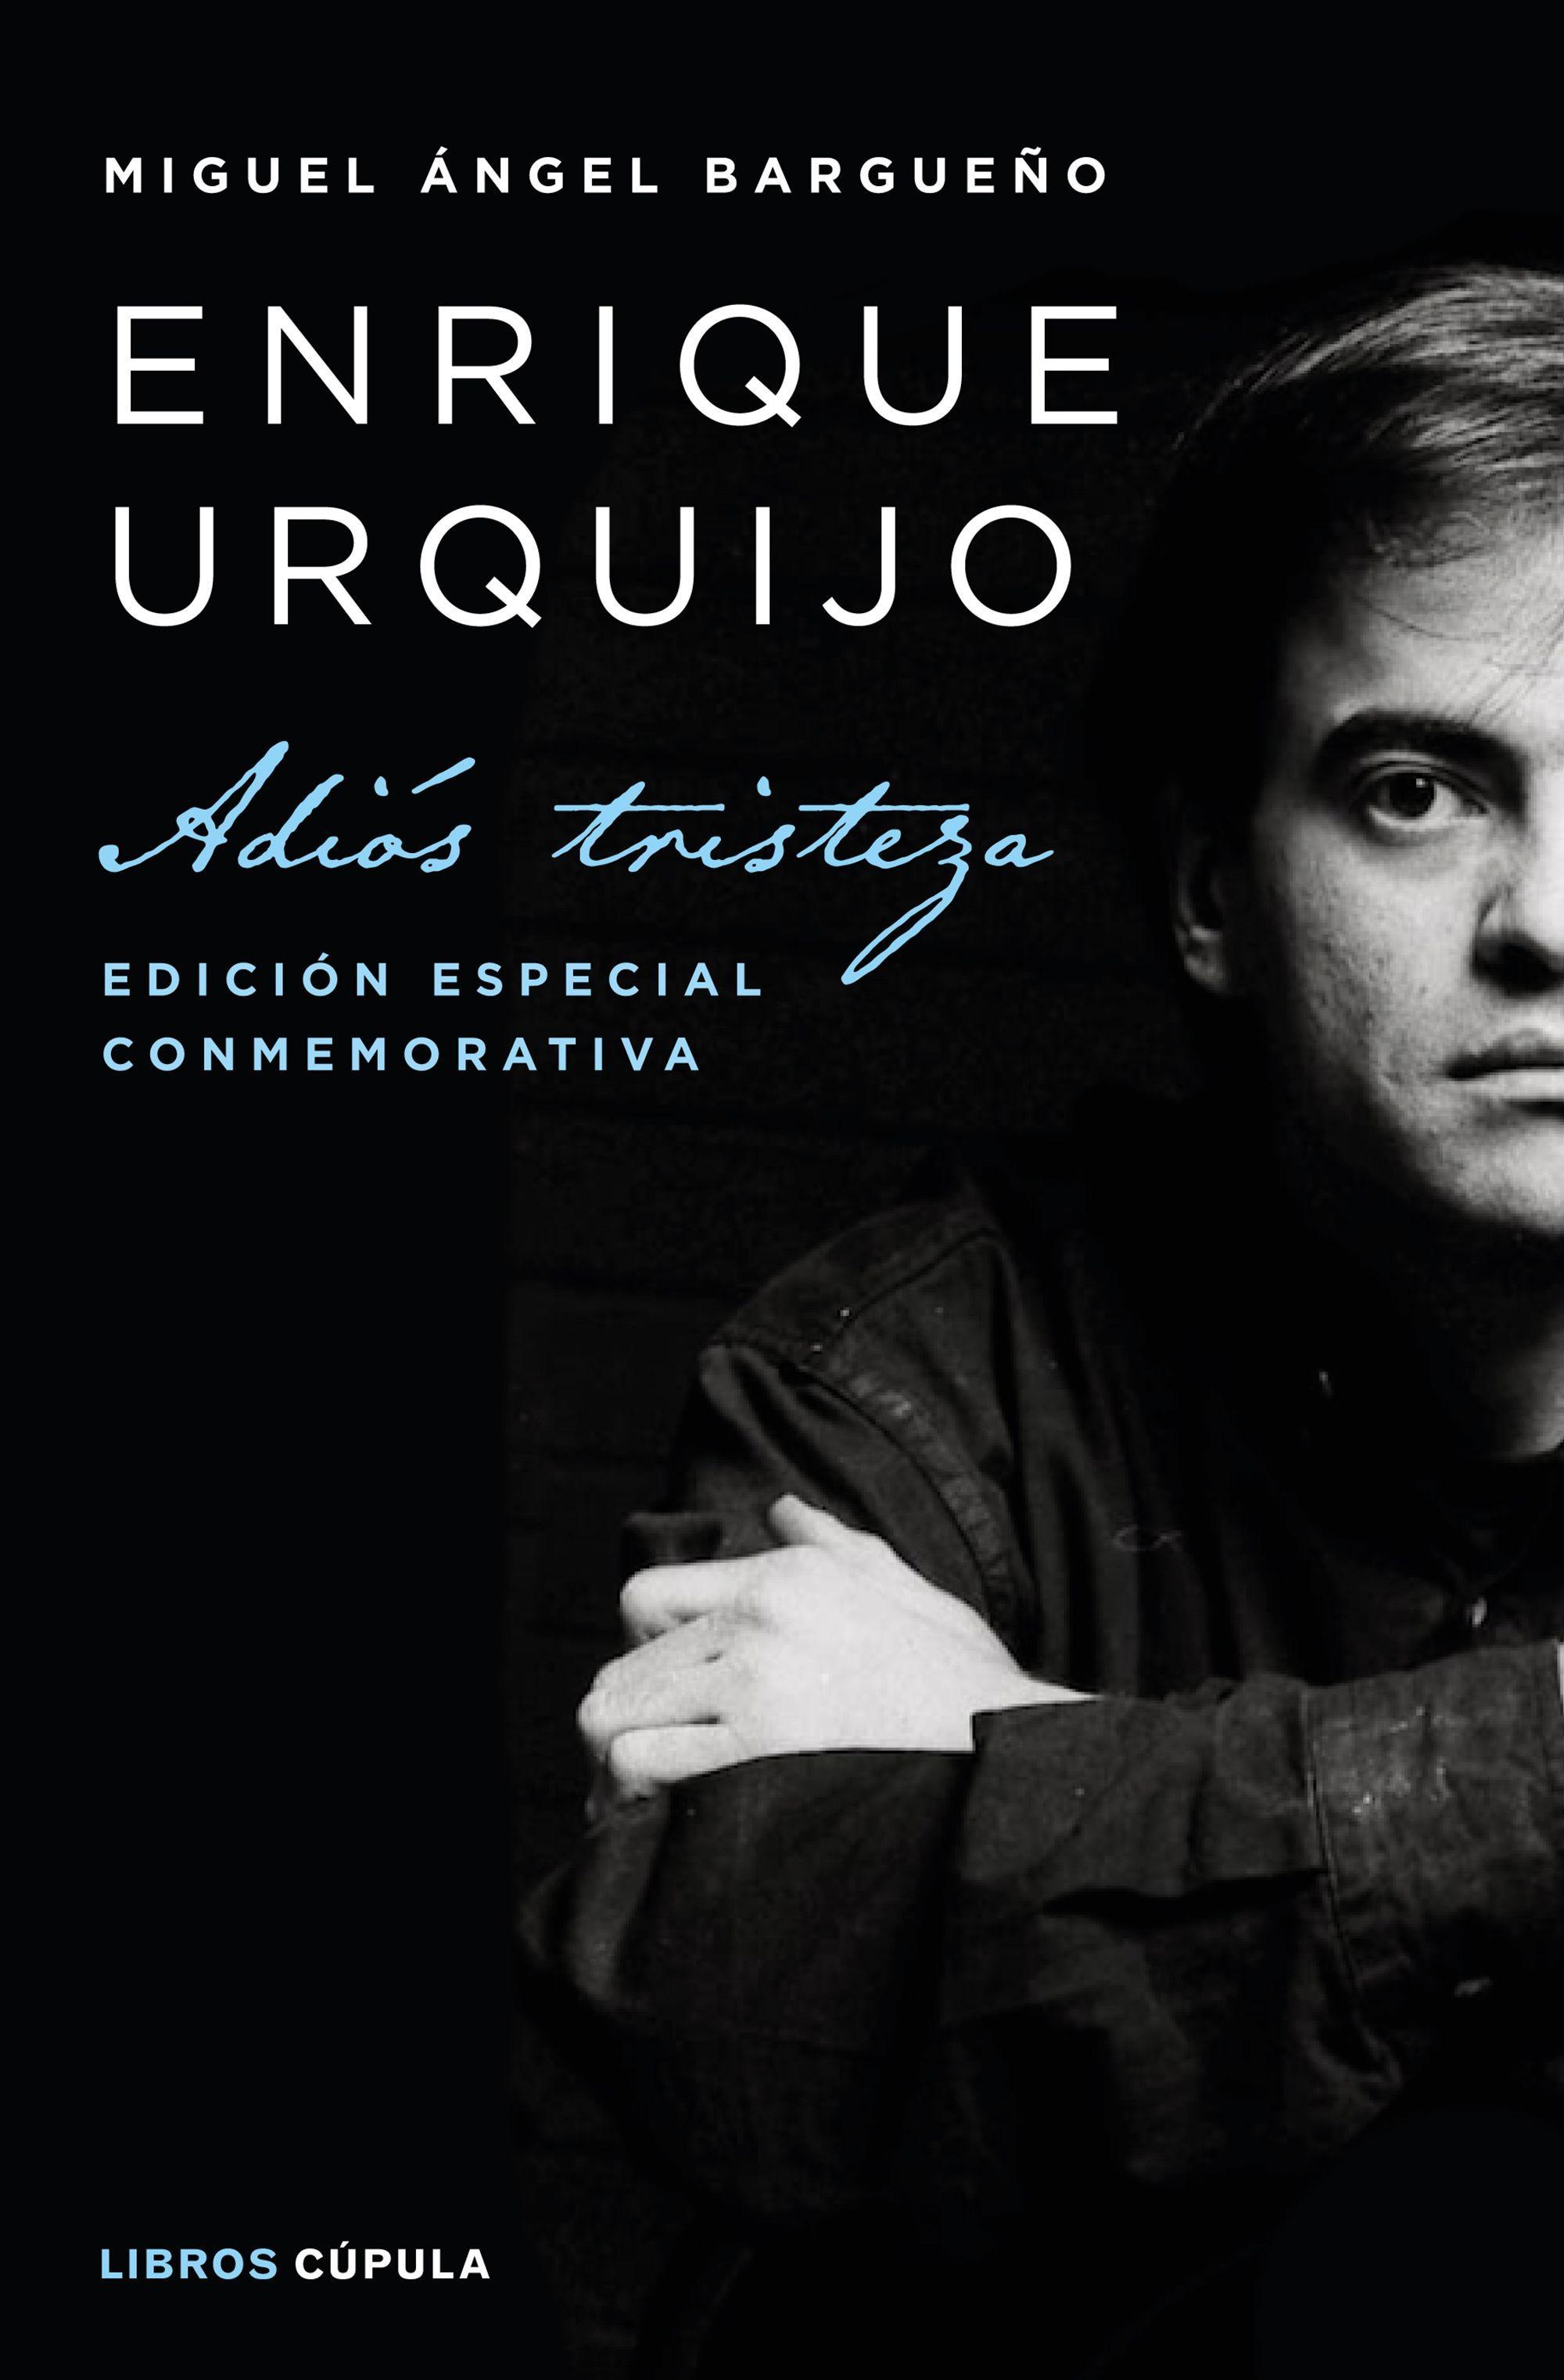 Enrique Urquijo. Adiós Tristeza (Miguel Ángel Bargueño, 2019)